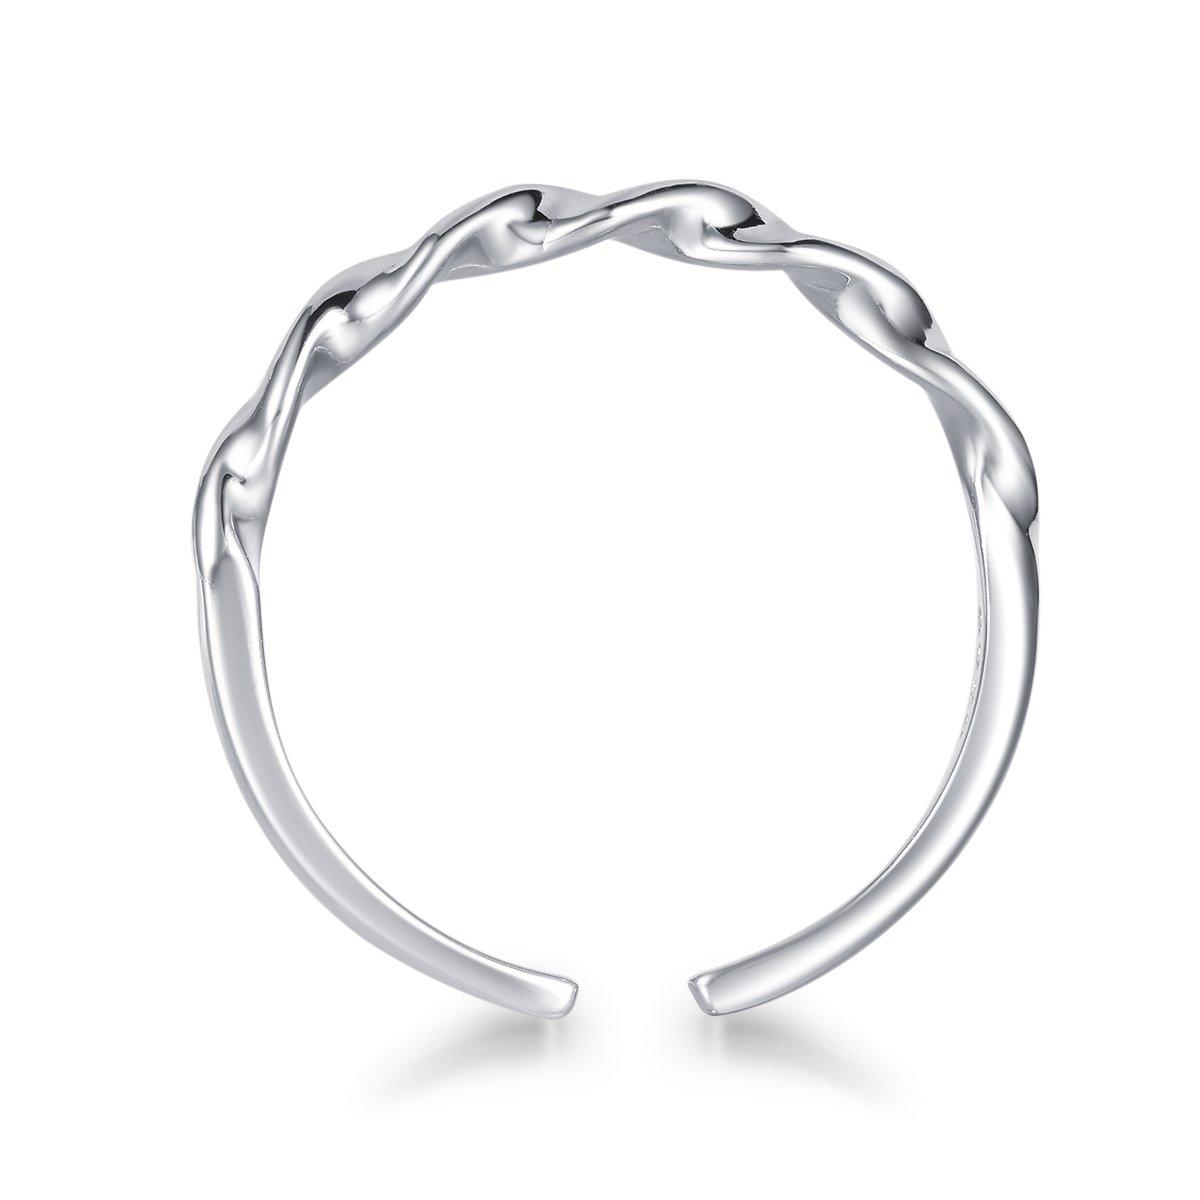 LYTOPTOP Women Waves Ring Fashion Sterling Sliver Jewellery Thumb Rings Adjustable Open Finger Ring Gift Box euYGvis